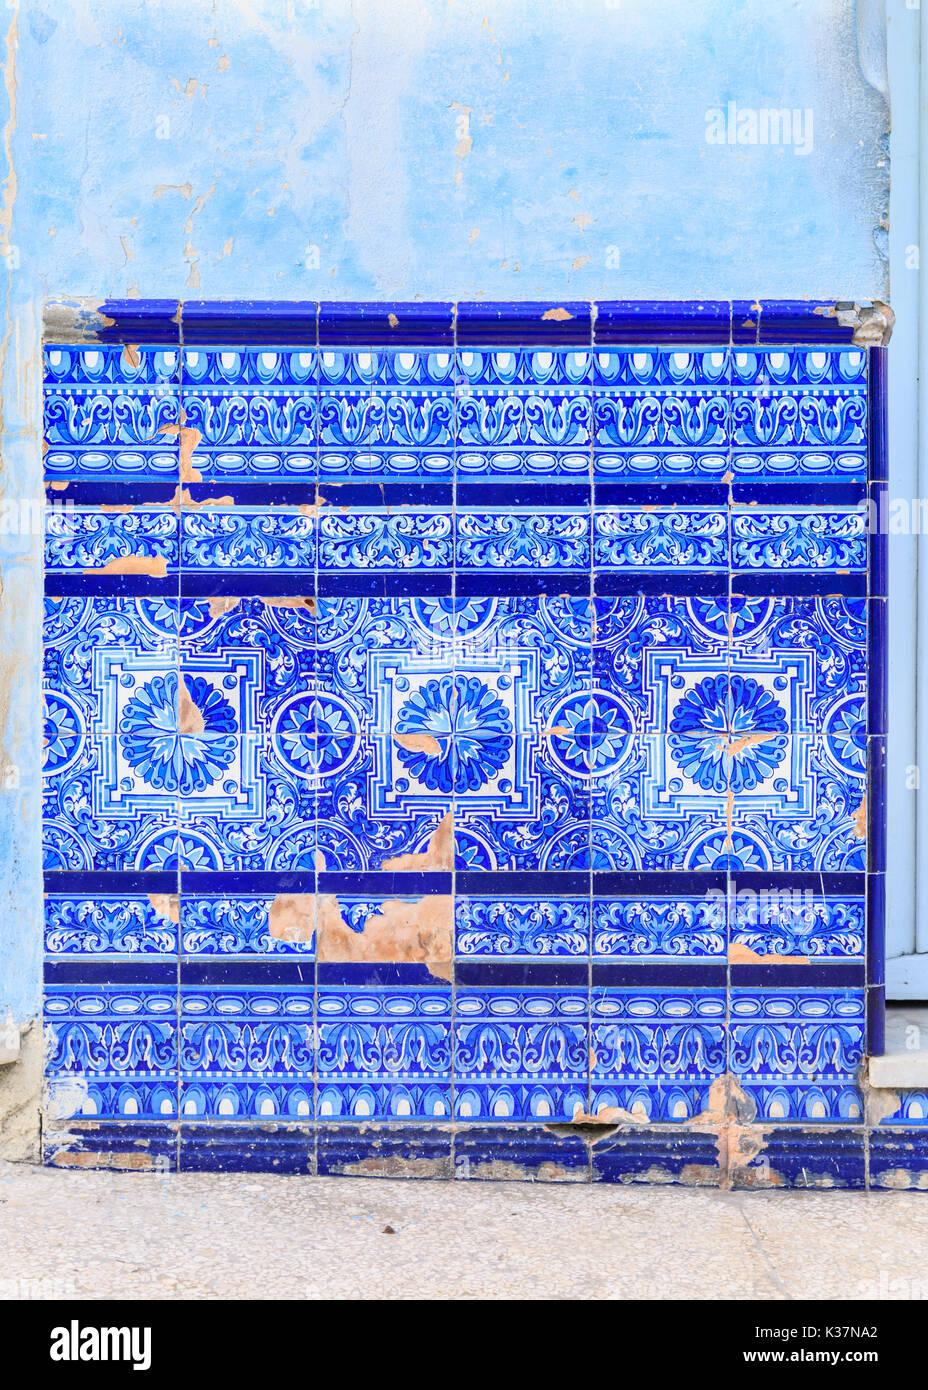 Blue Spanish or Portuguese Mediterranean heritage azulejos tiles on wall in Havana, Cuba - Stock Image